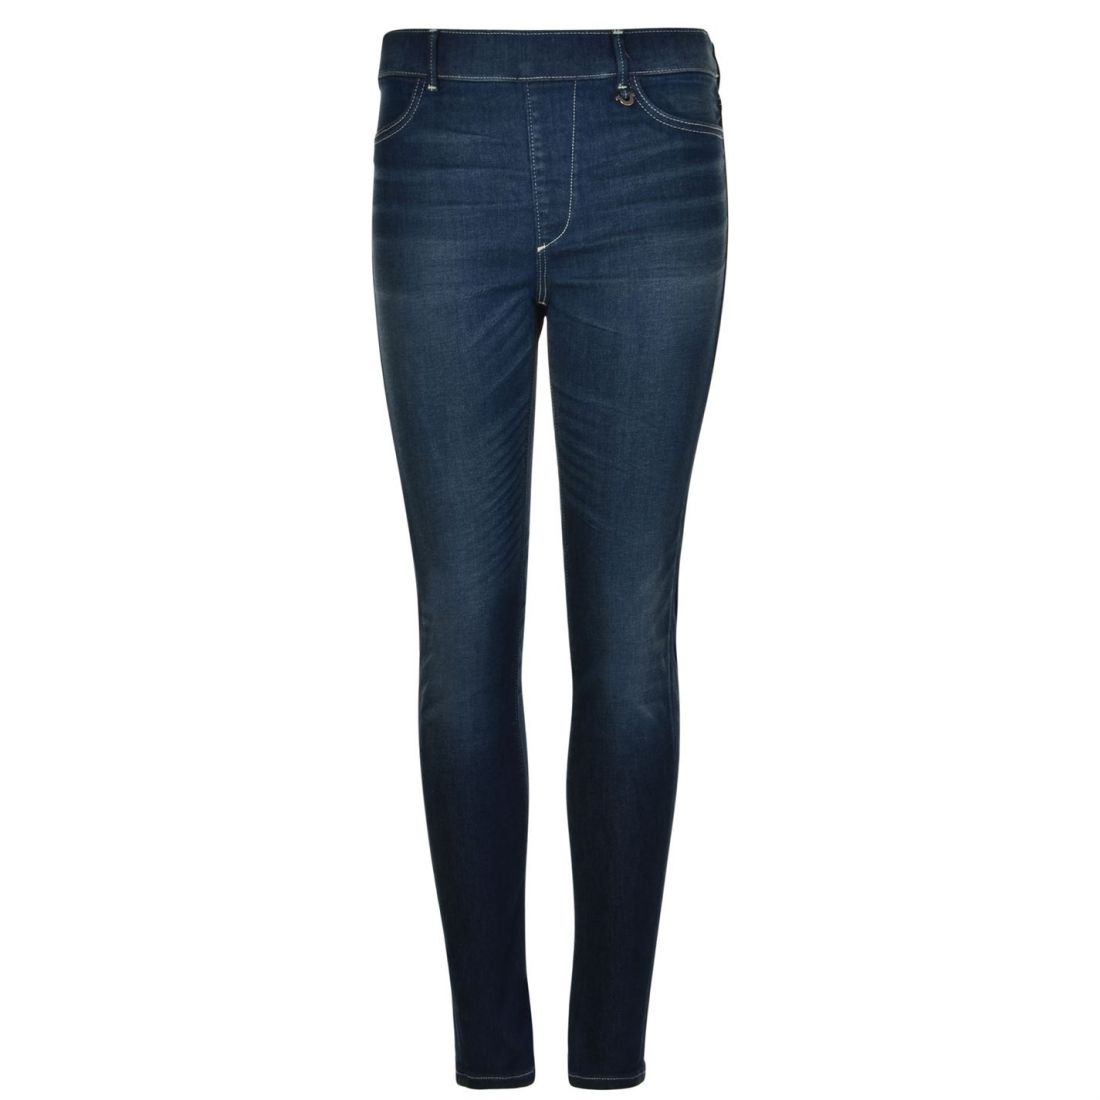 35bca47349cad Image is loading Womens-TRUE-RELIGION-Runway-Legging-Jeans-Slim-Skinny-